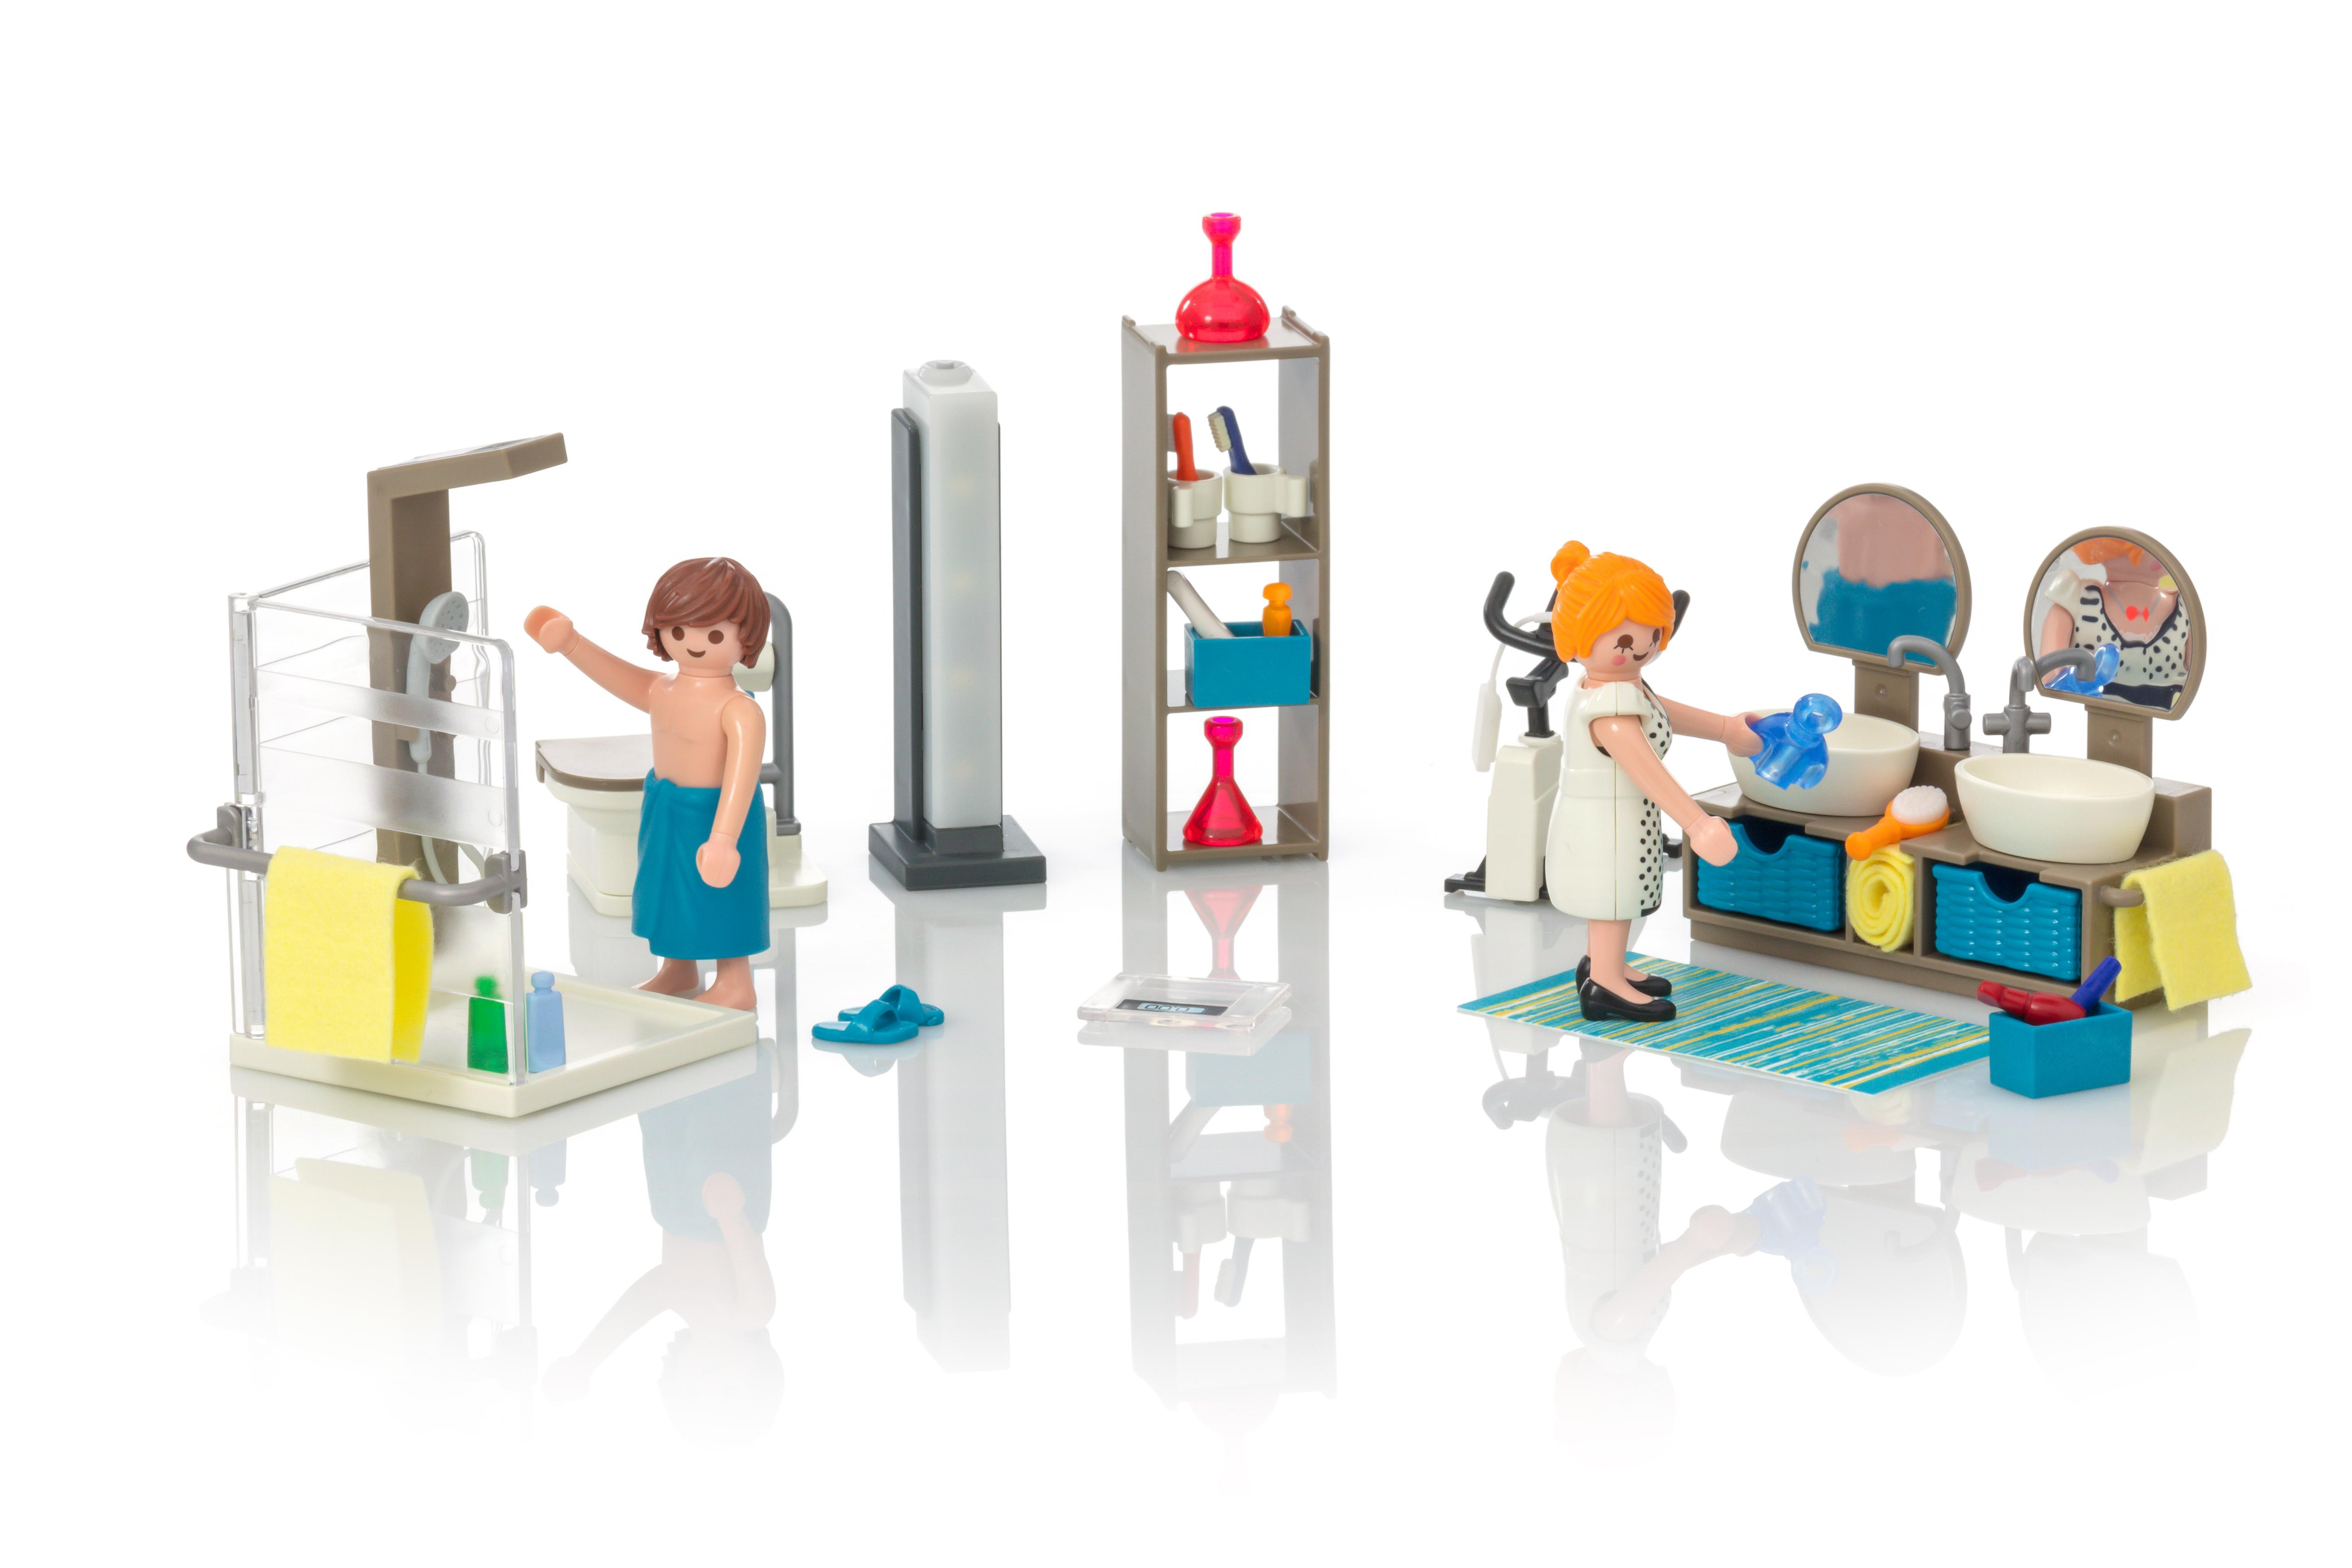 Bathroom 9268 Playmobil United Kingdom